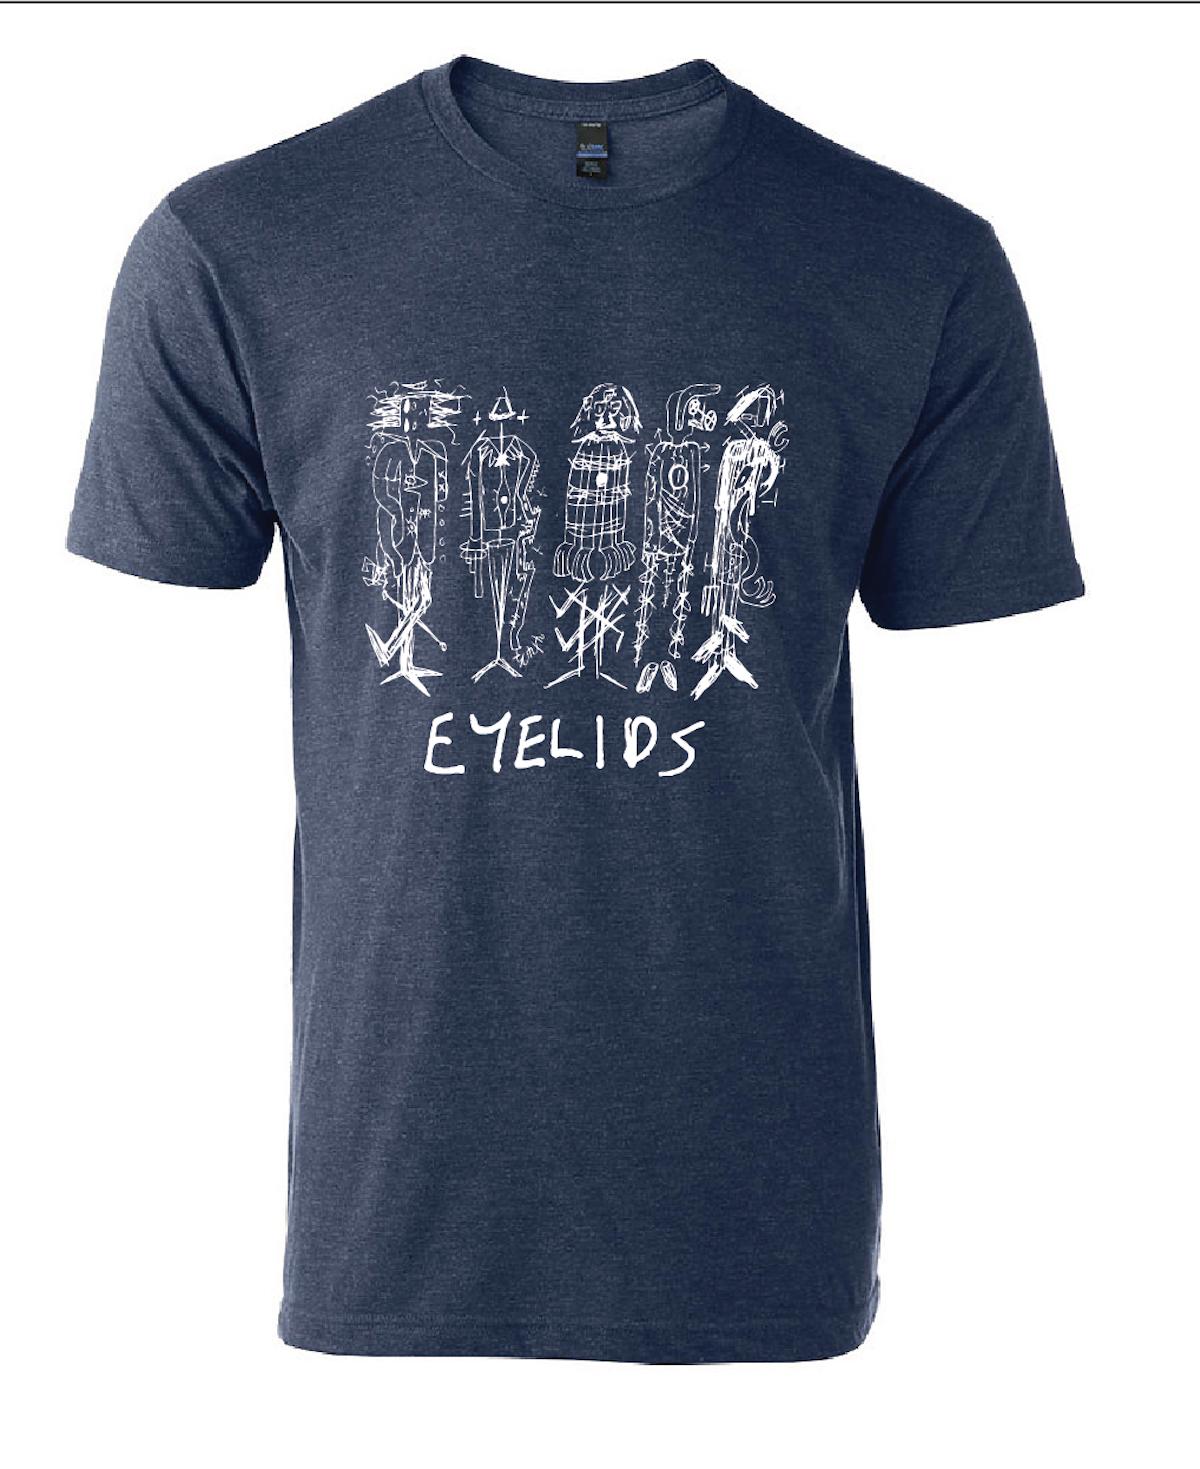 eyelids explosion shirt.png